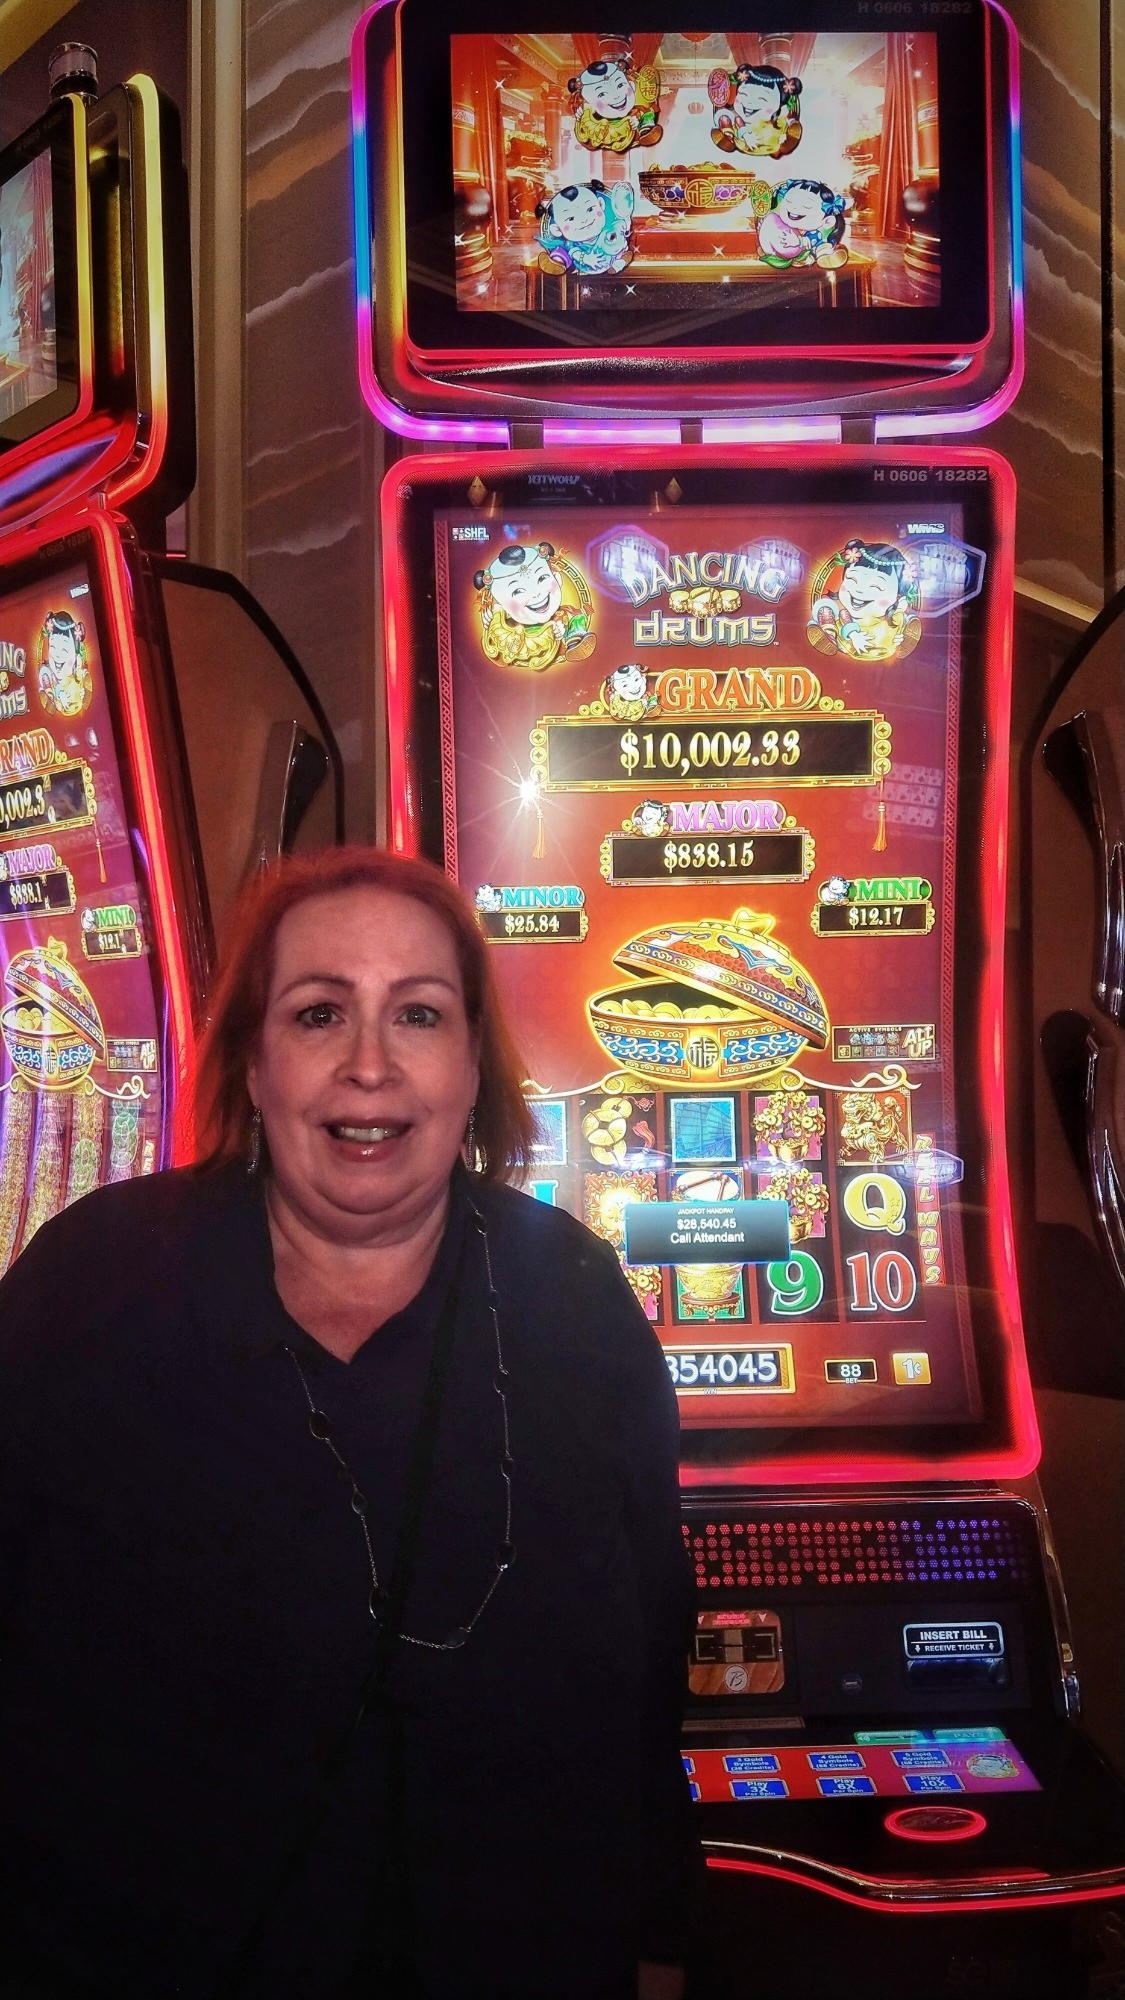 £ 205 Daily freeroll slot մրցաշարում Sloto'Cash- ում